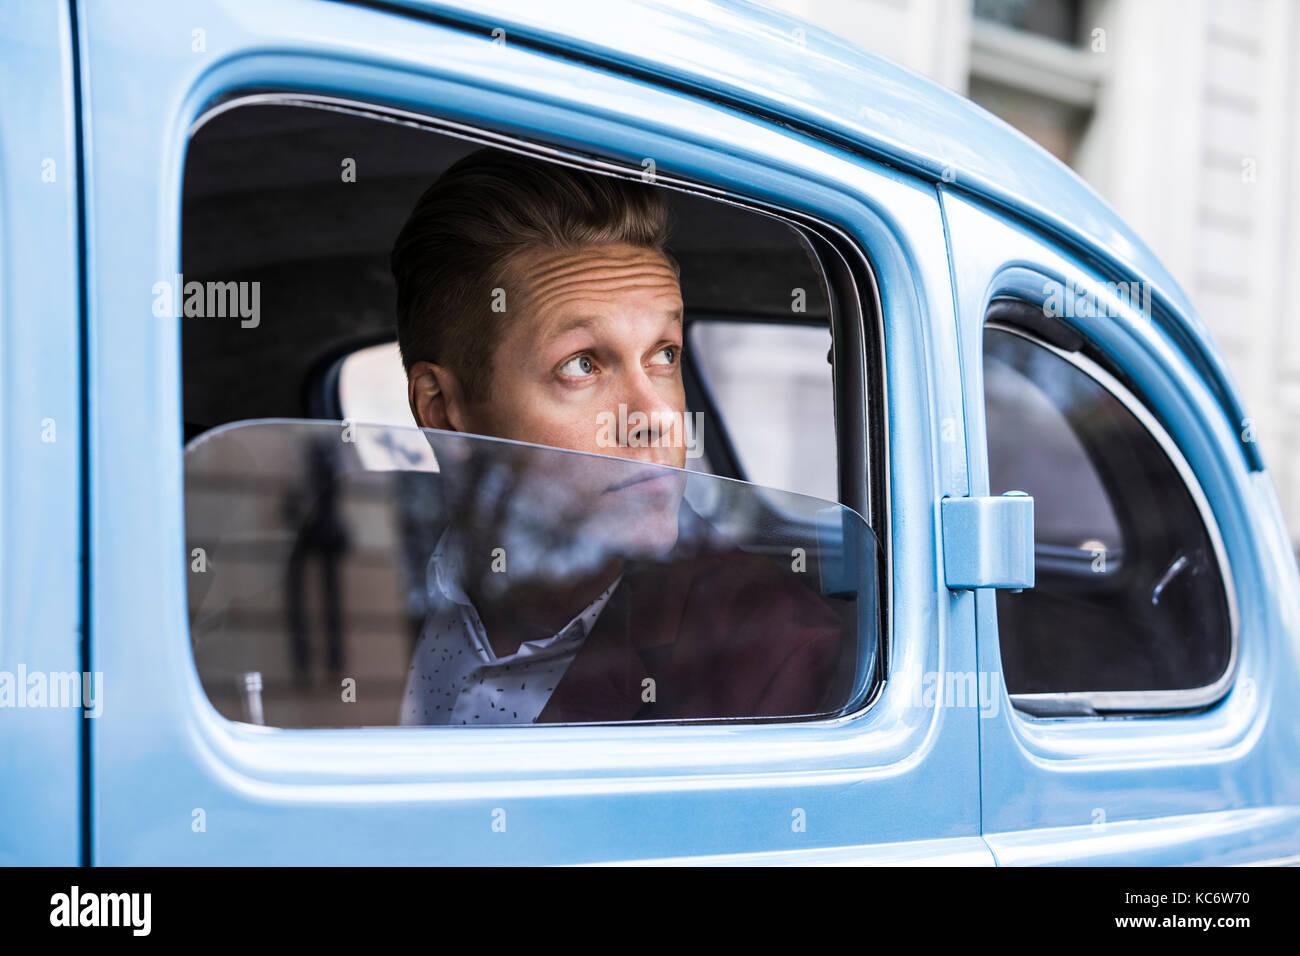 Man looking through window in retro car - Stock Image